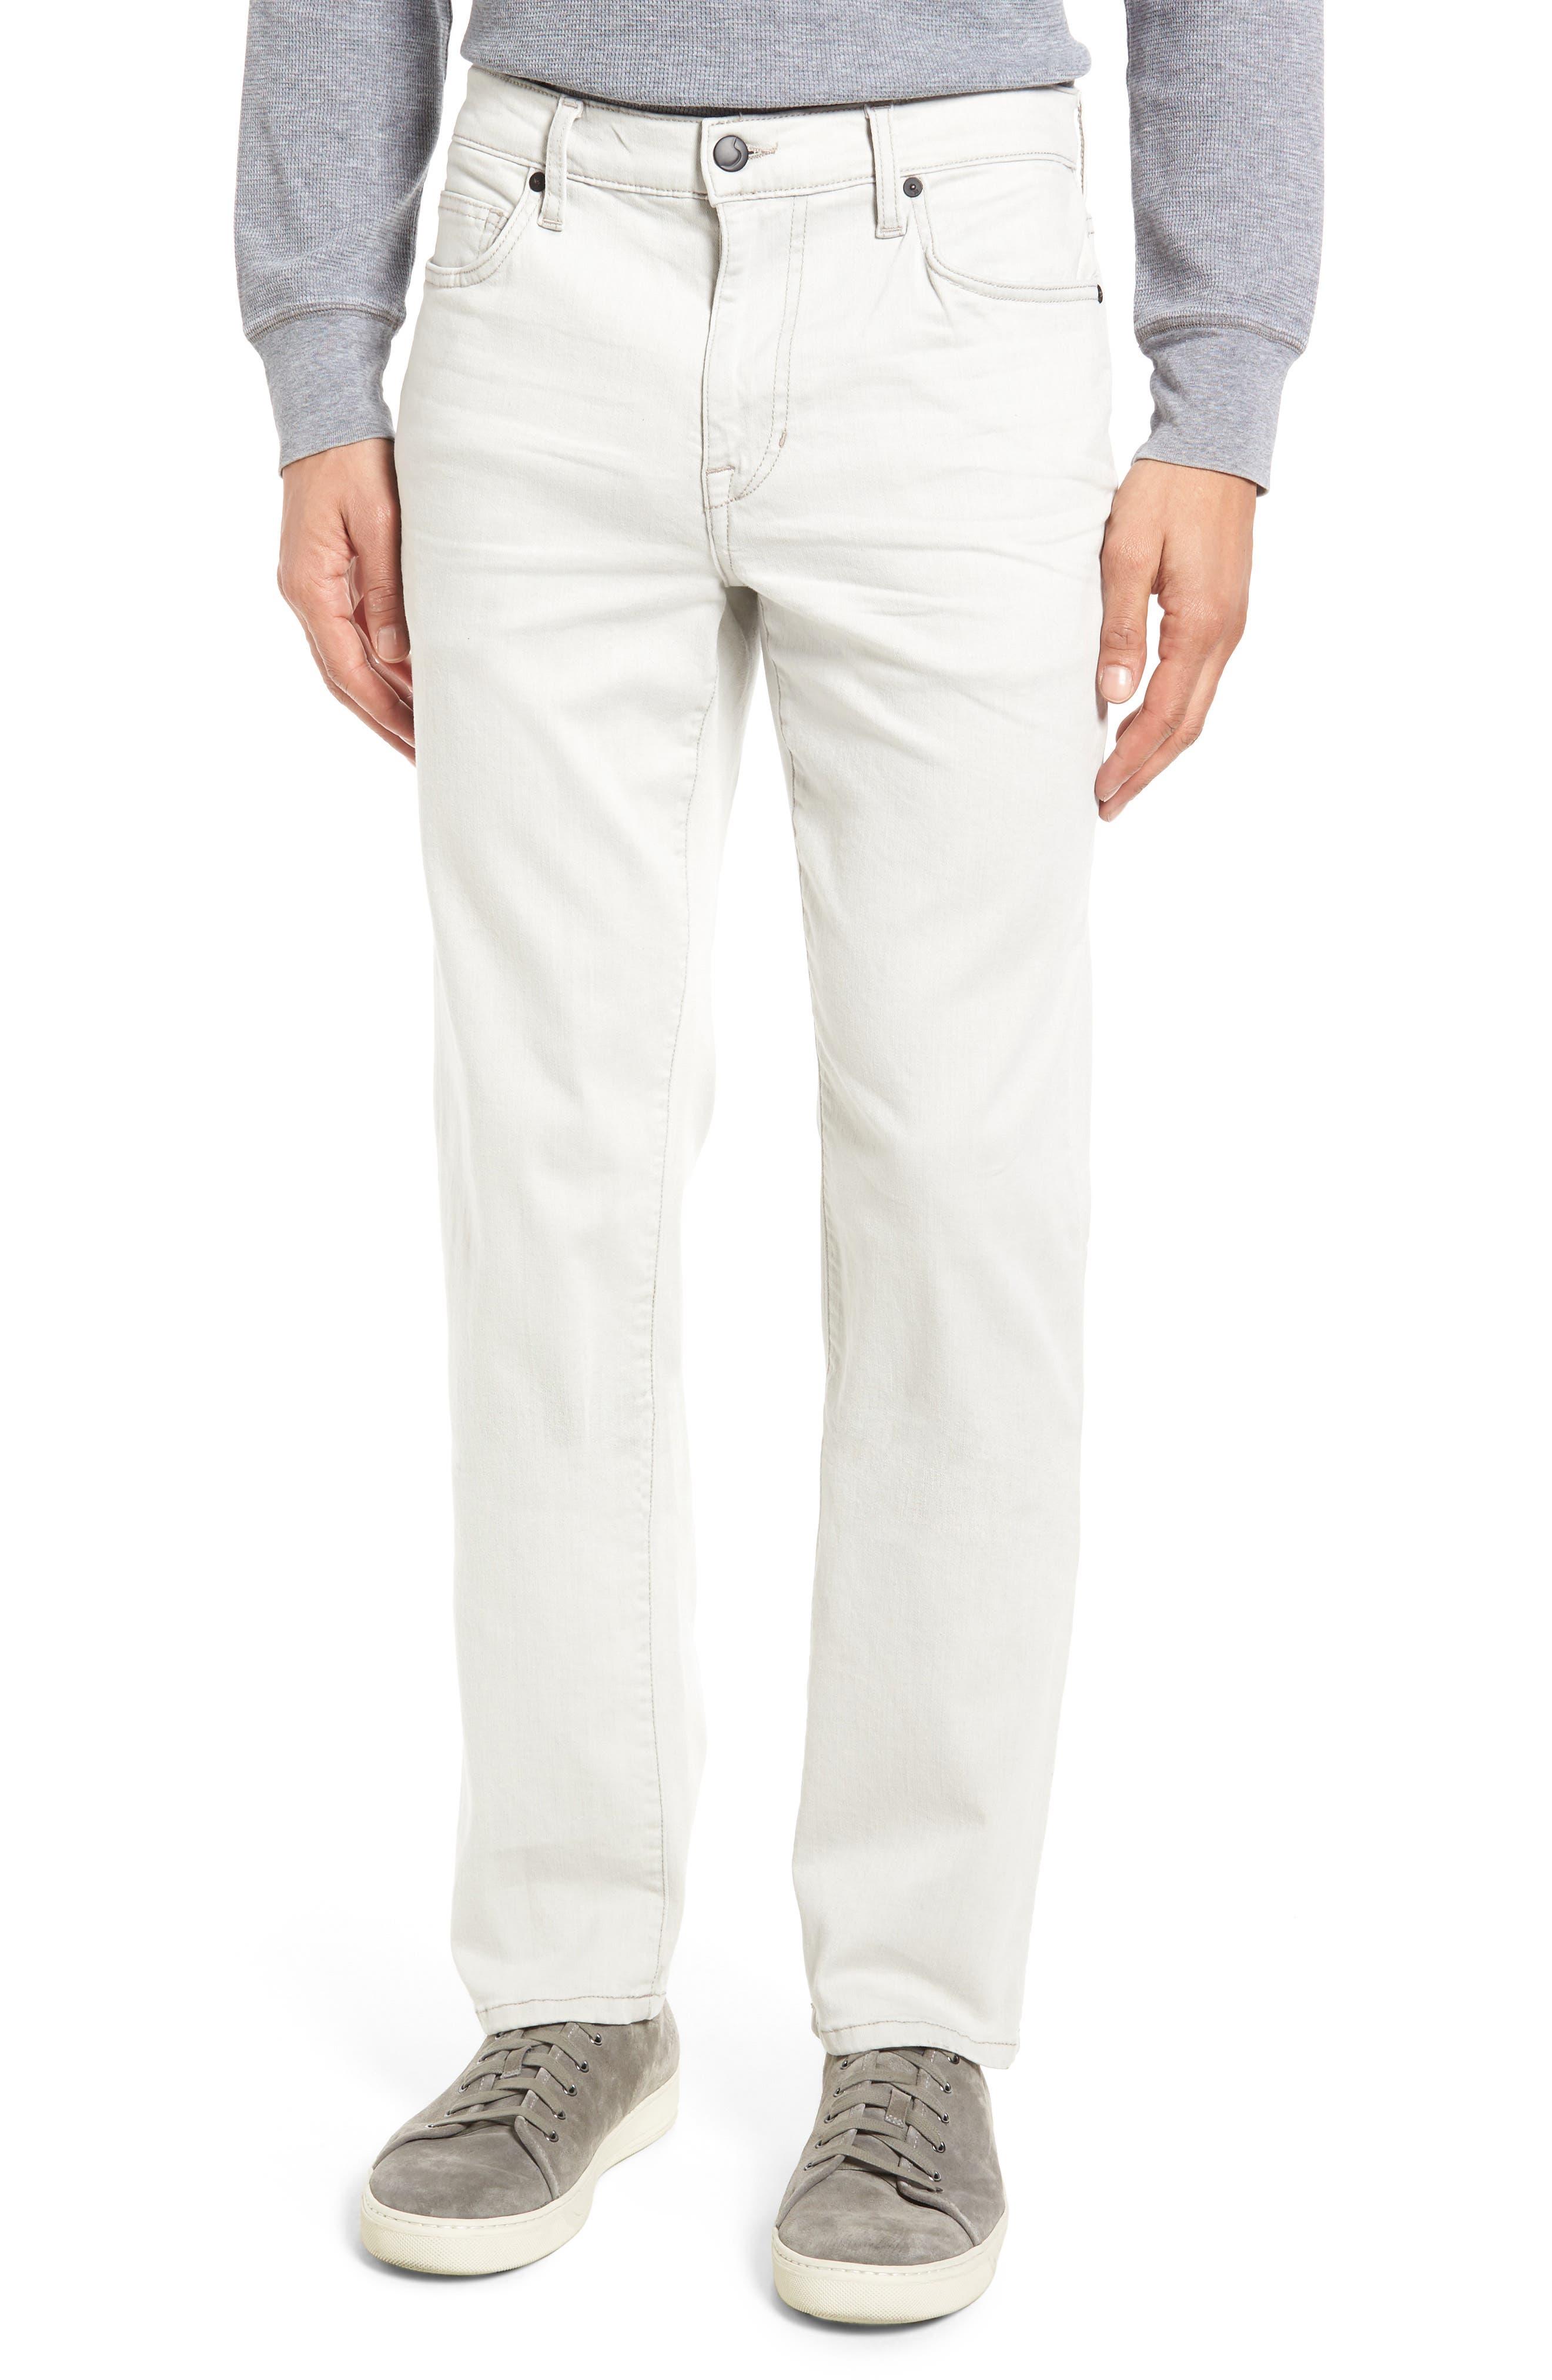 Main Image - Joe's Slim Fit Jeans (Bryson)